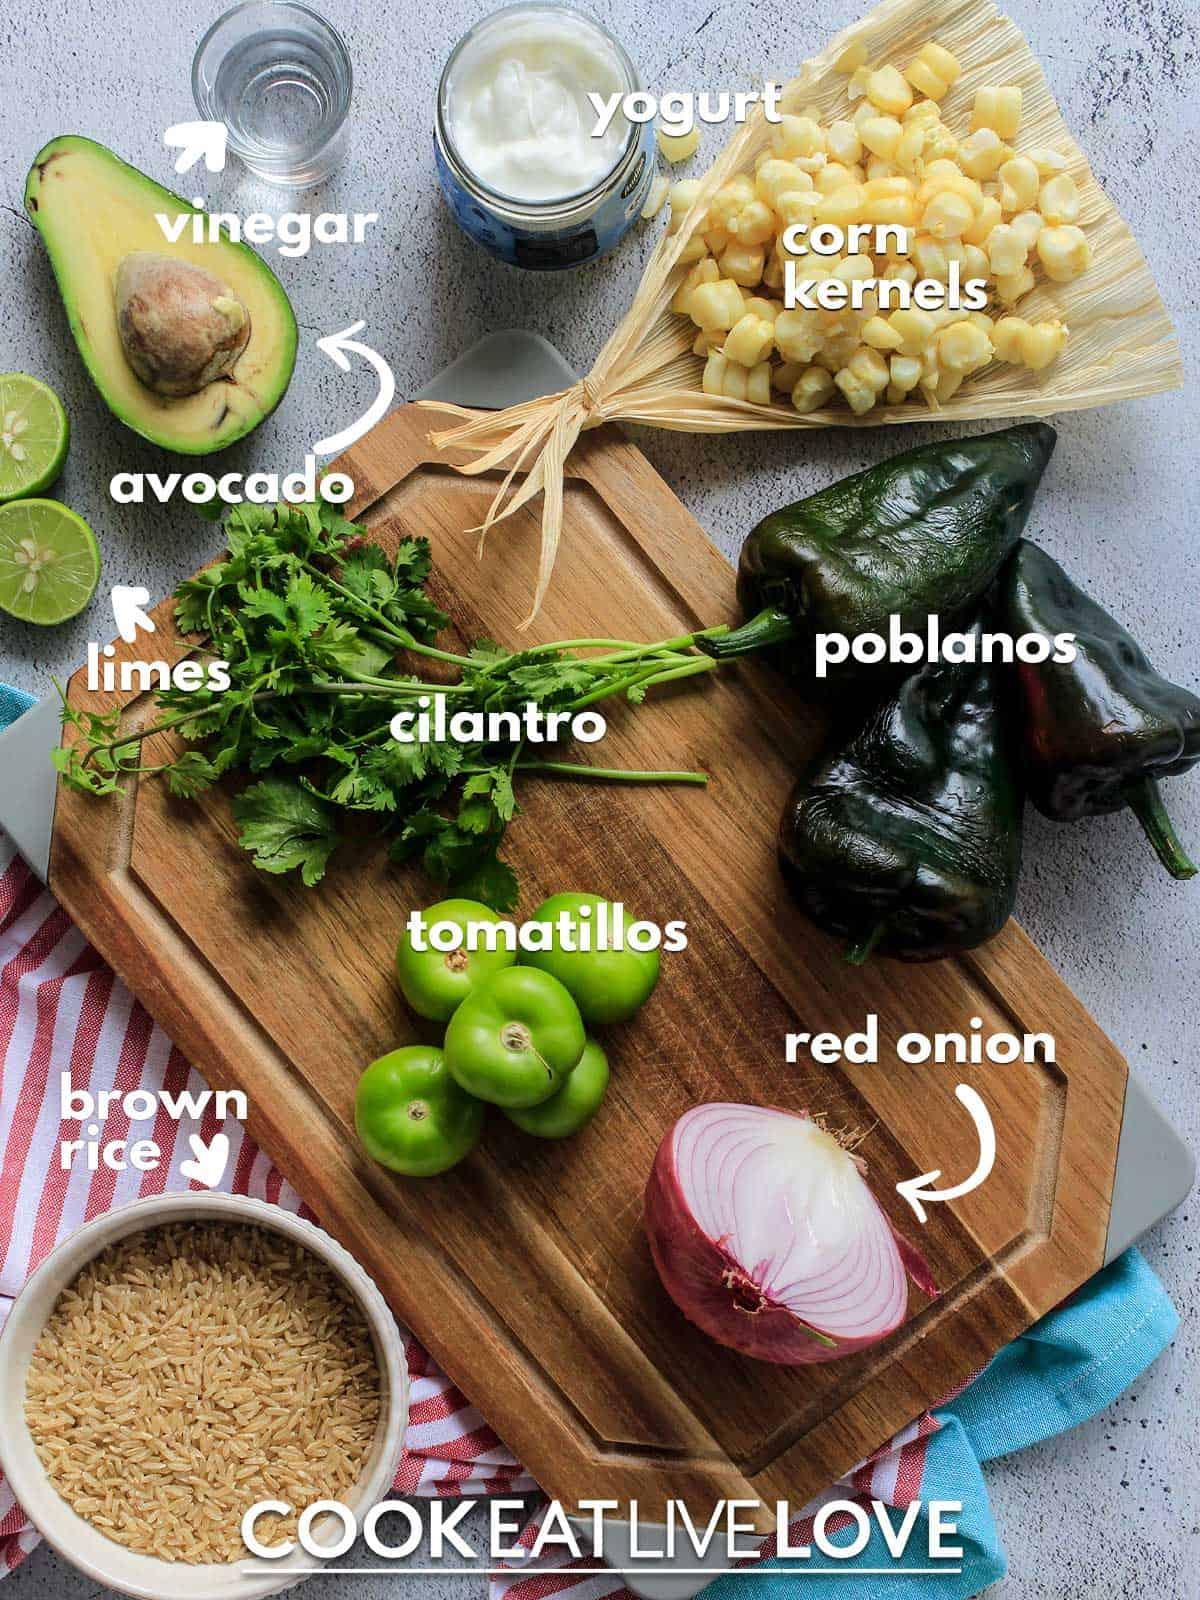 Ingredients to make vegetarian stuffed poblanos on table